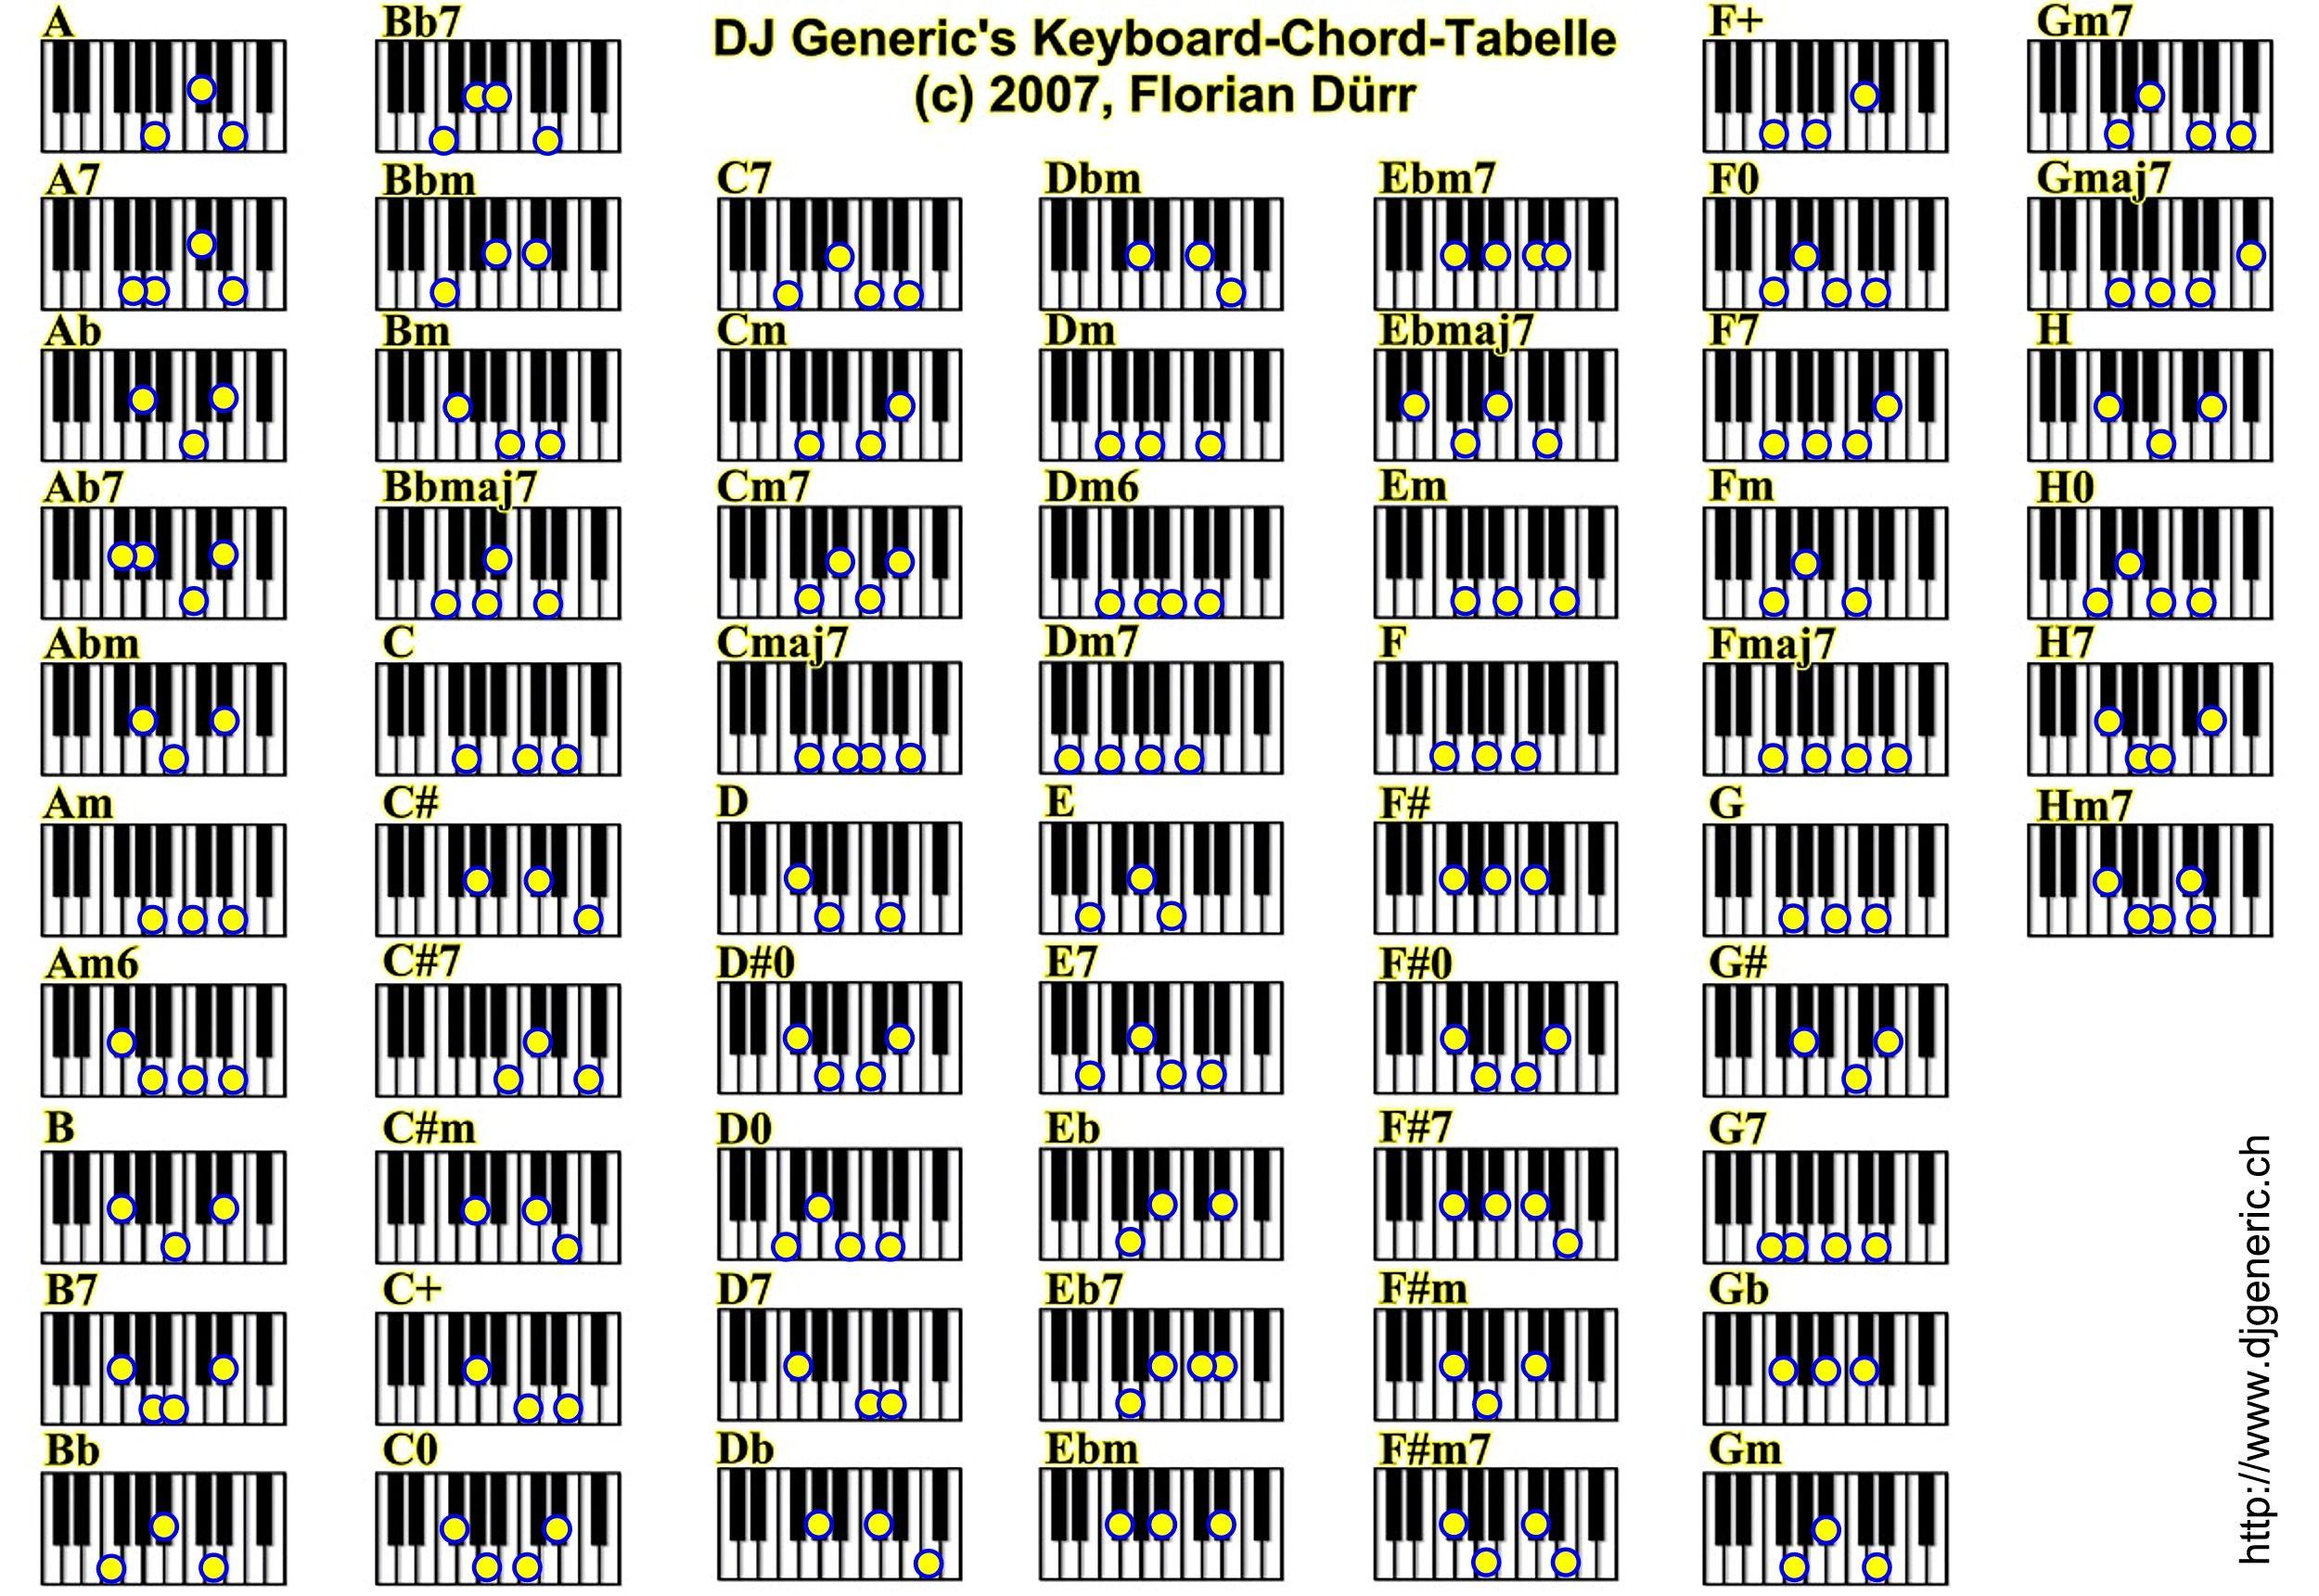 Piano+chord+guide   Piano chords, Piano chords sheet, Keyboard piano